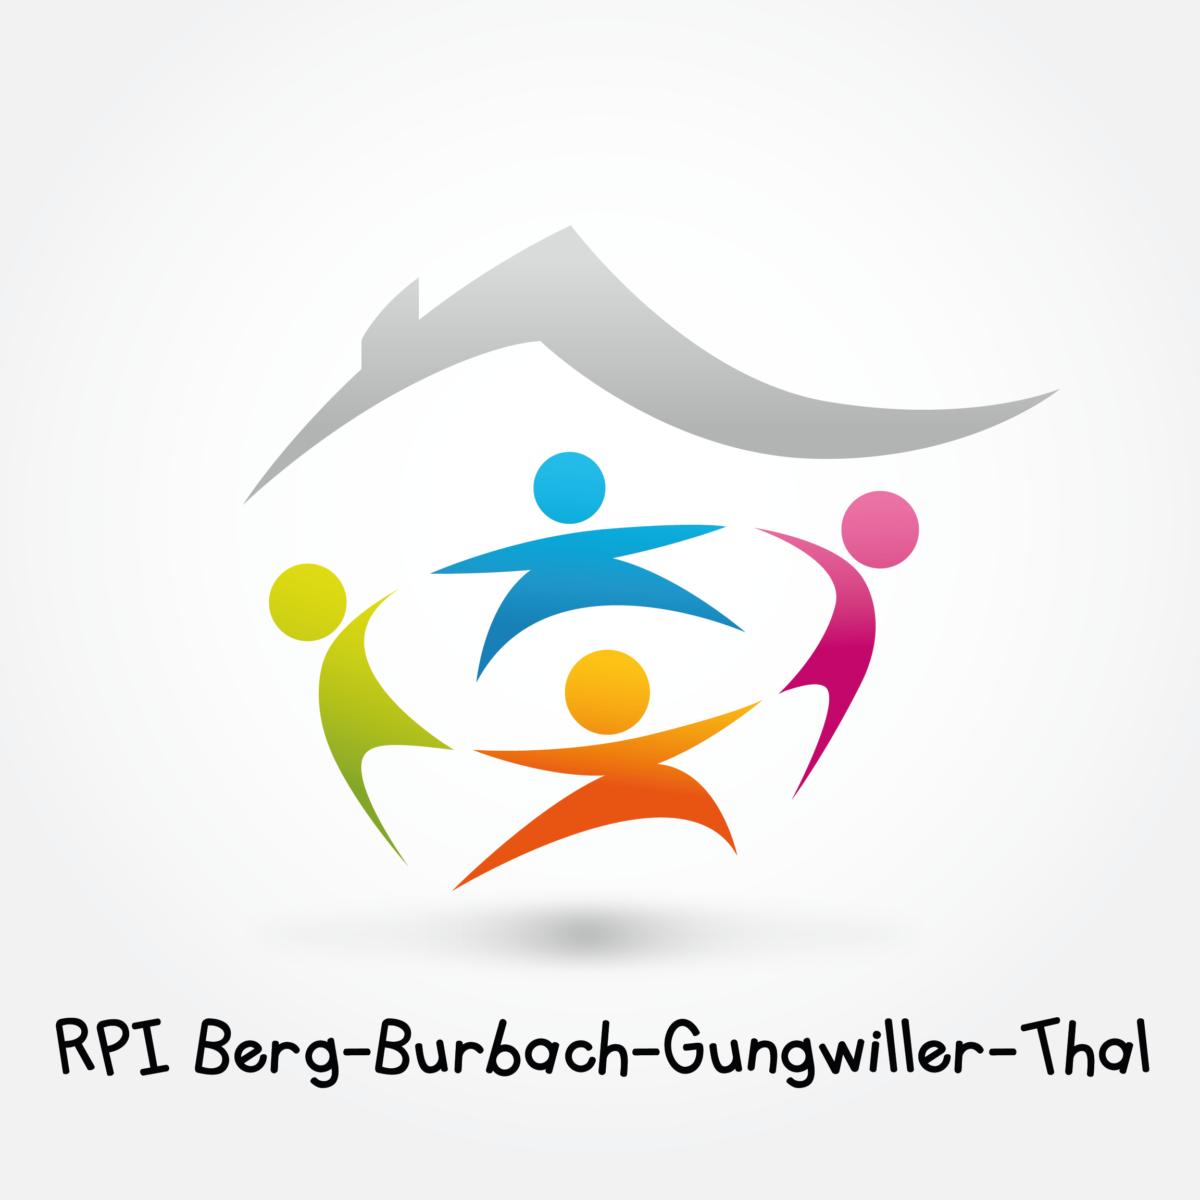 RPI Berg-Burbach-Gungwiller-Thal